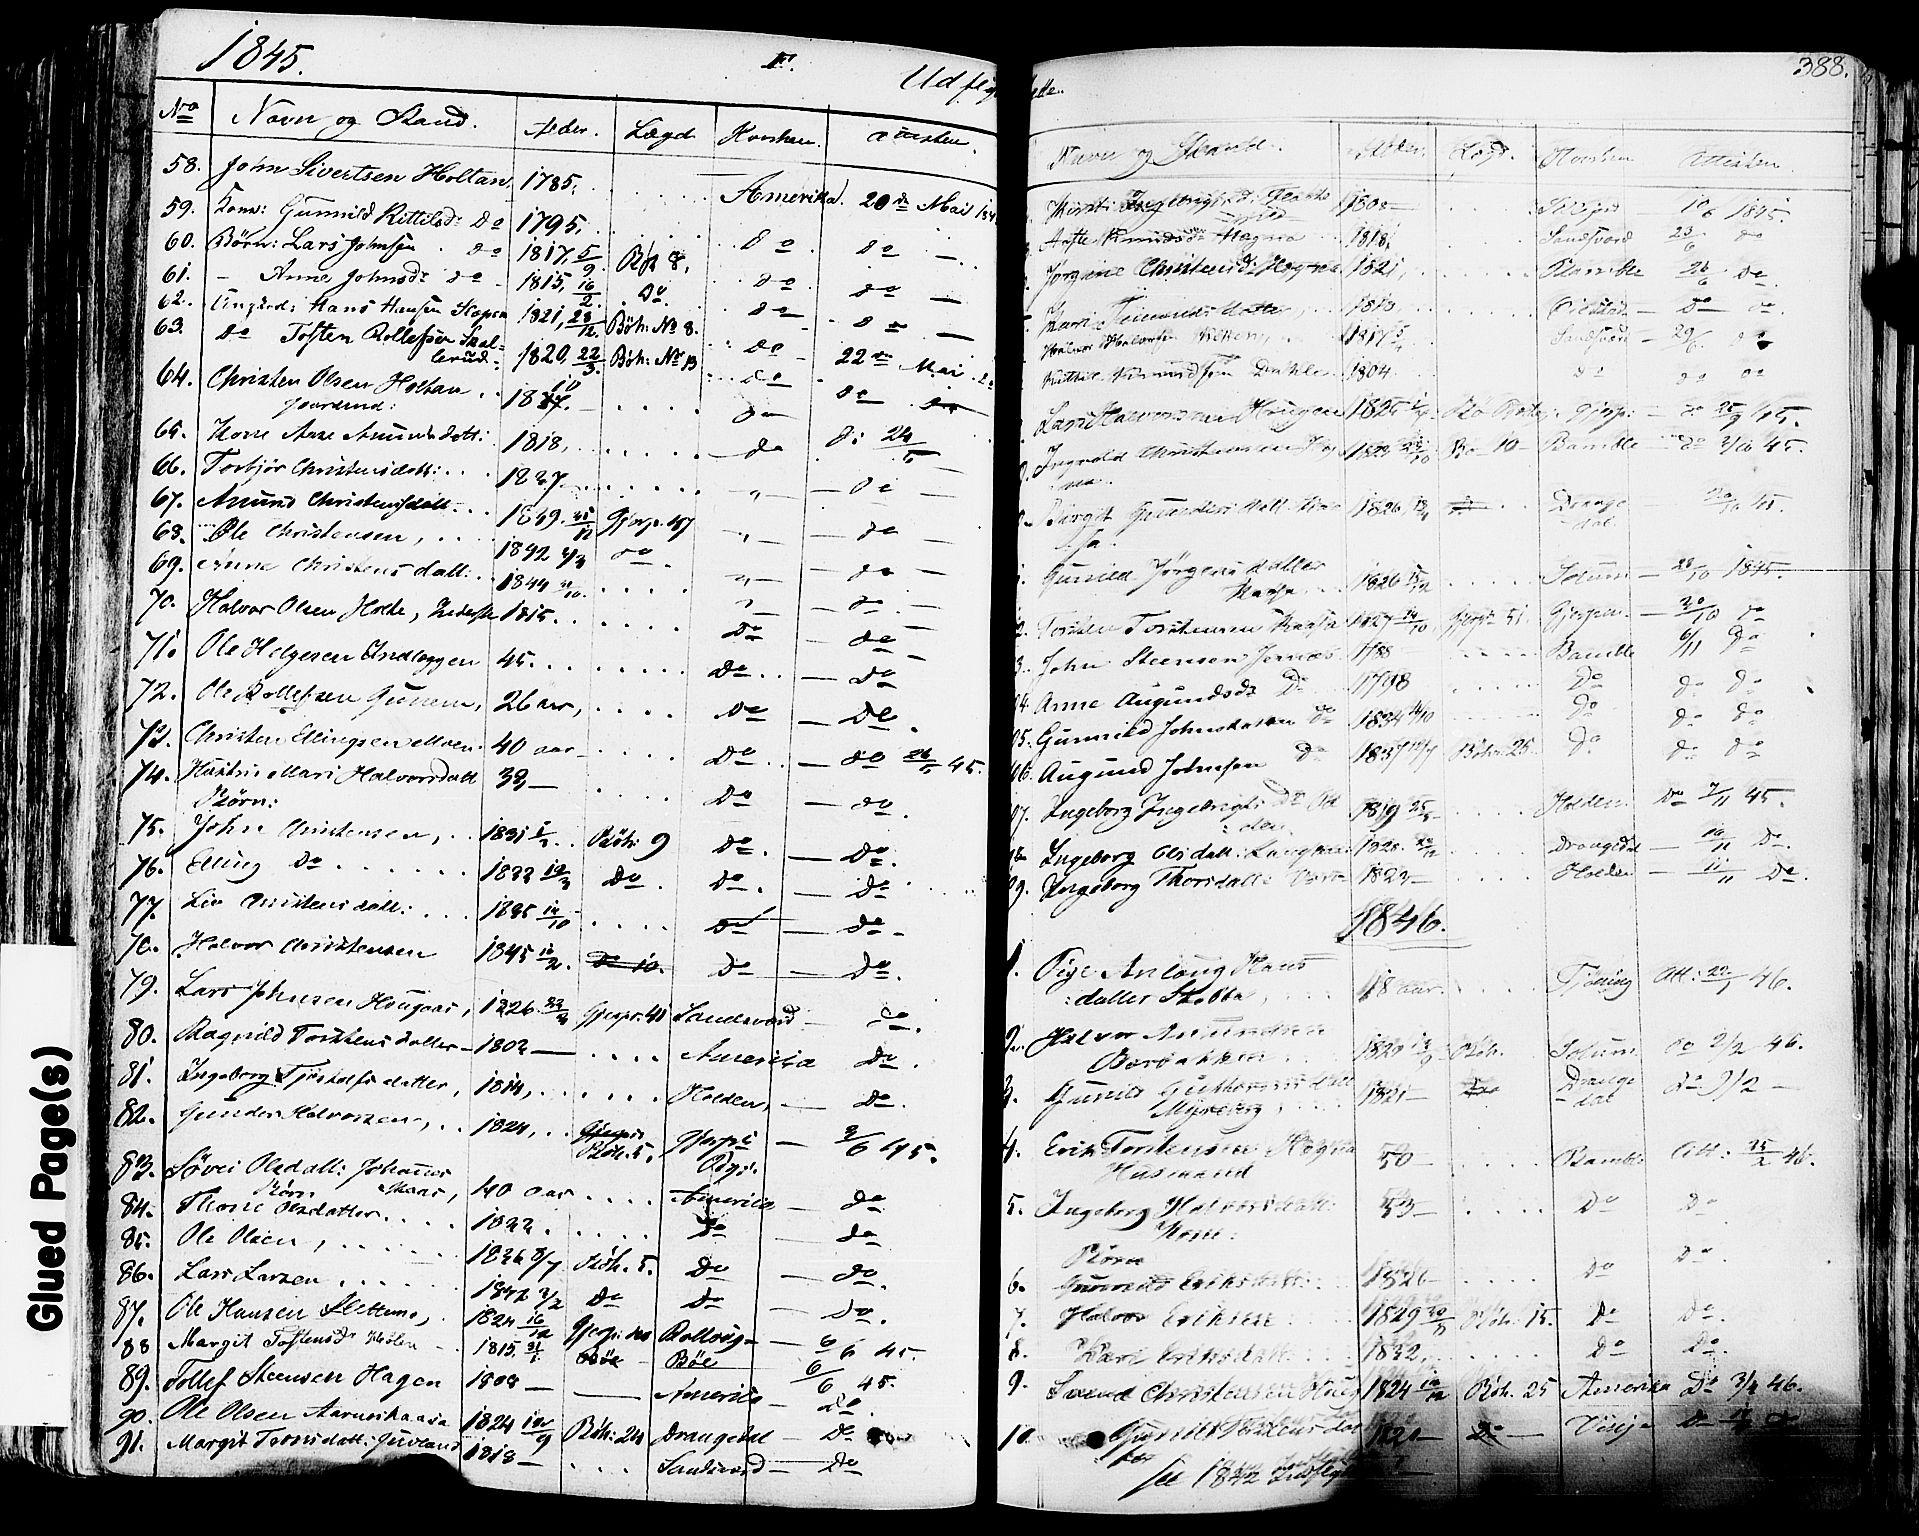 SAKO, Sauherad kirkebøker, F/Fa/L0006: Ministerialbok nr. I 6, 1827-1850, s. 388